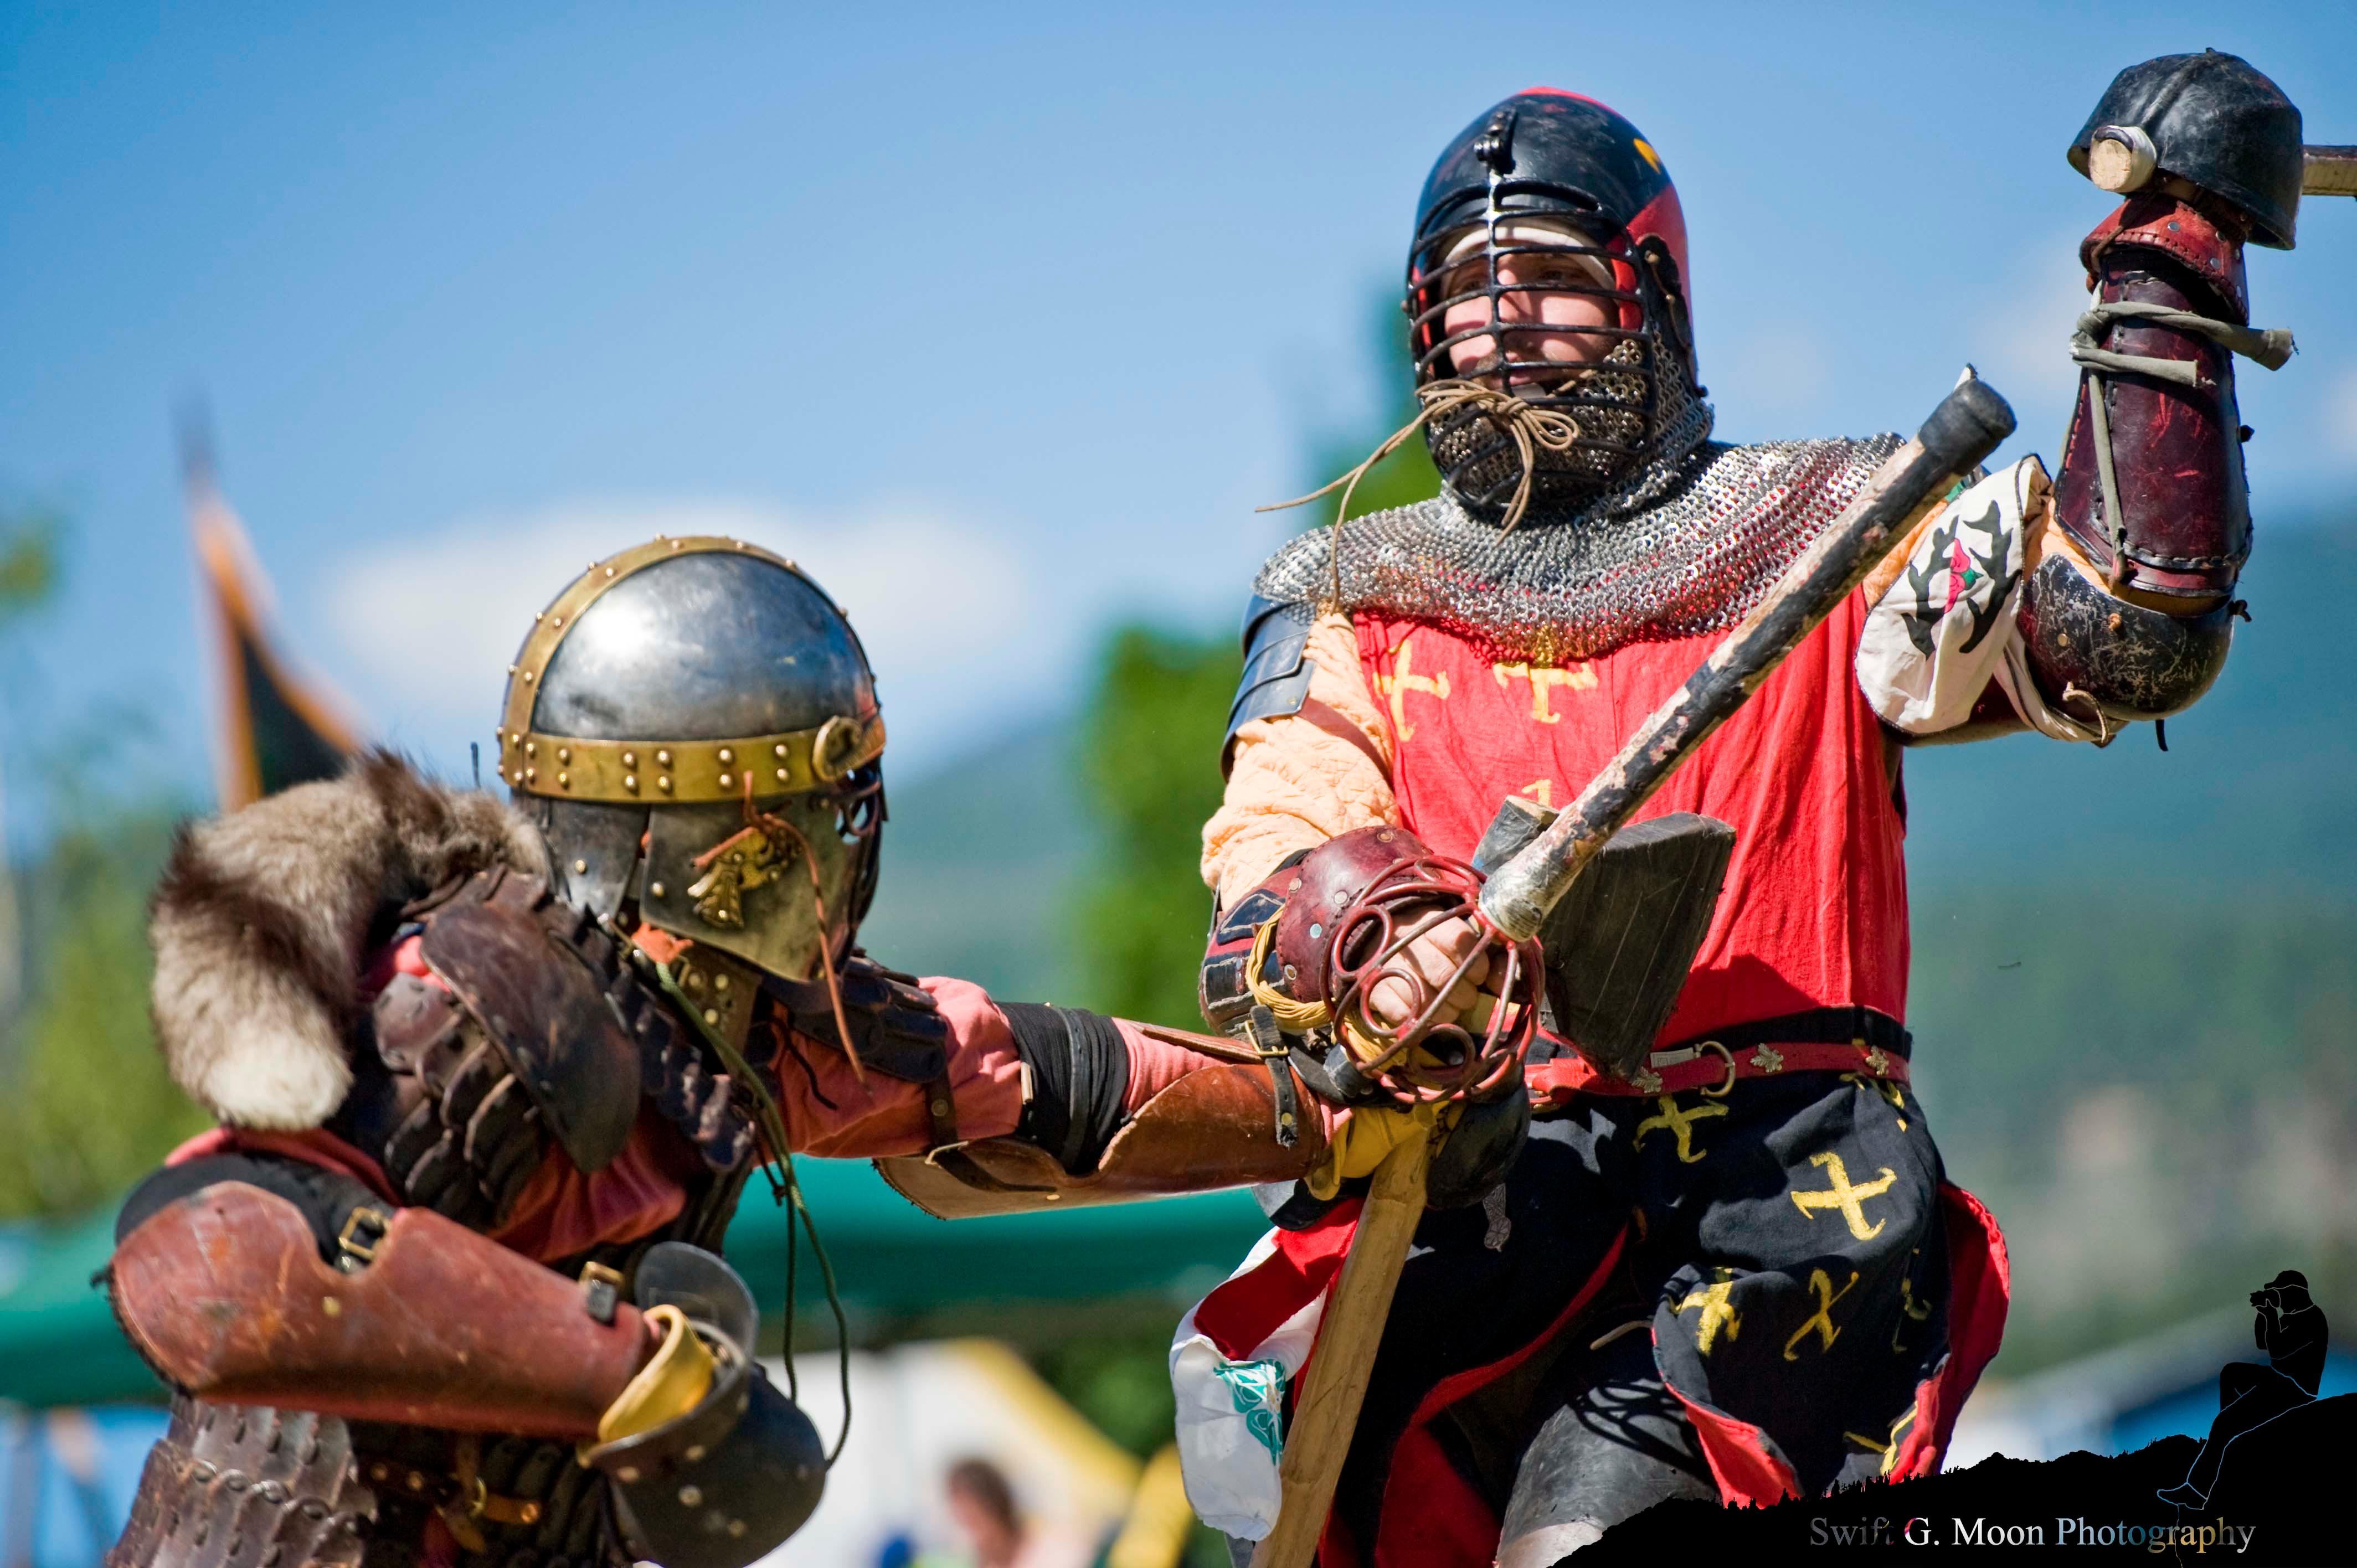 sca_west_kingdom_june_crown_by_swiftgmoon-d577ic4 fighting